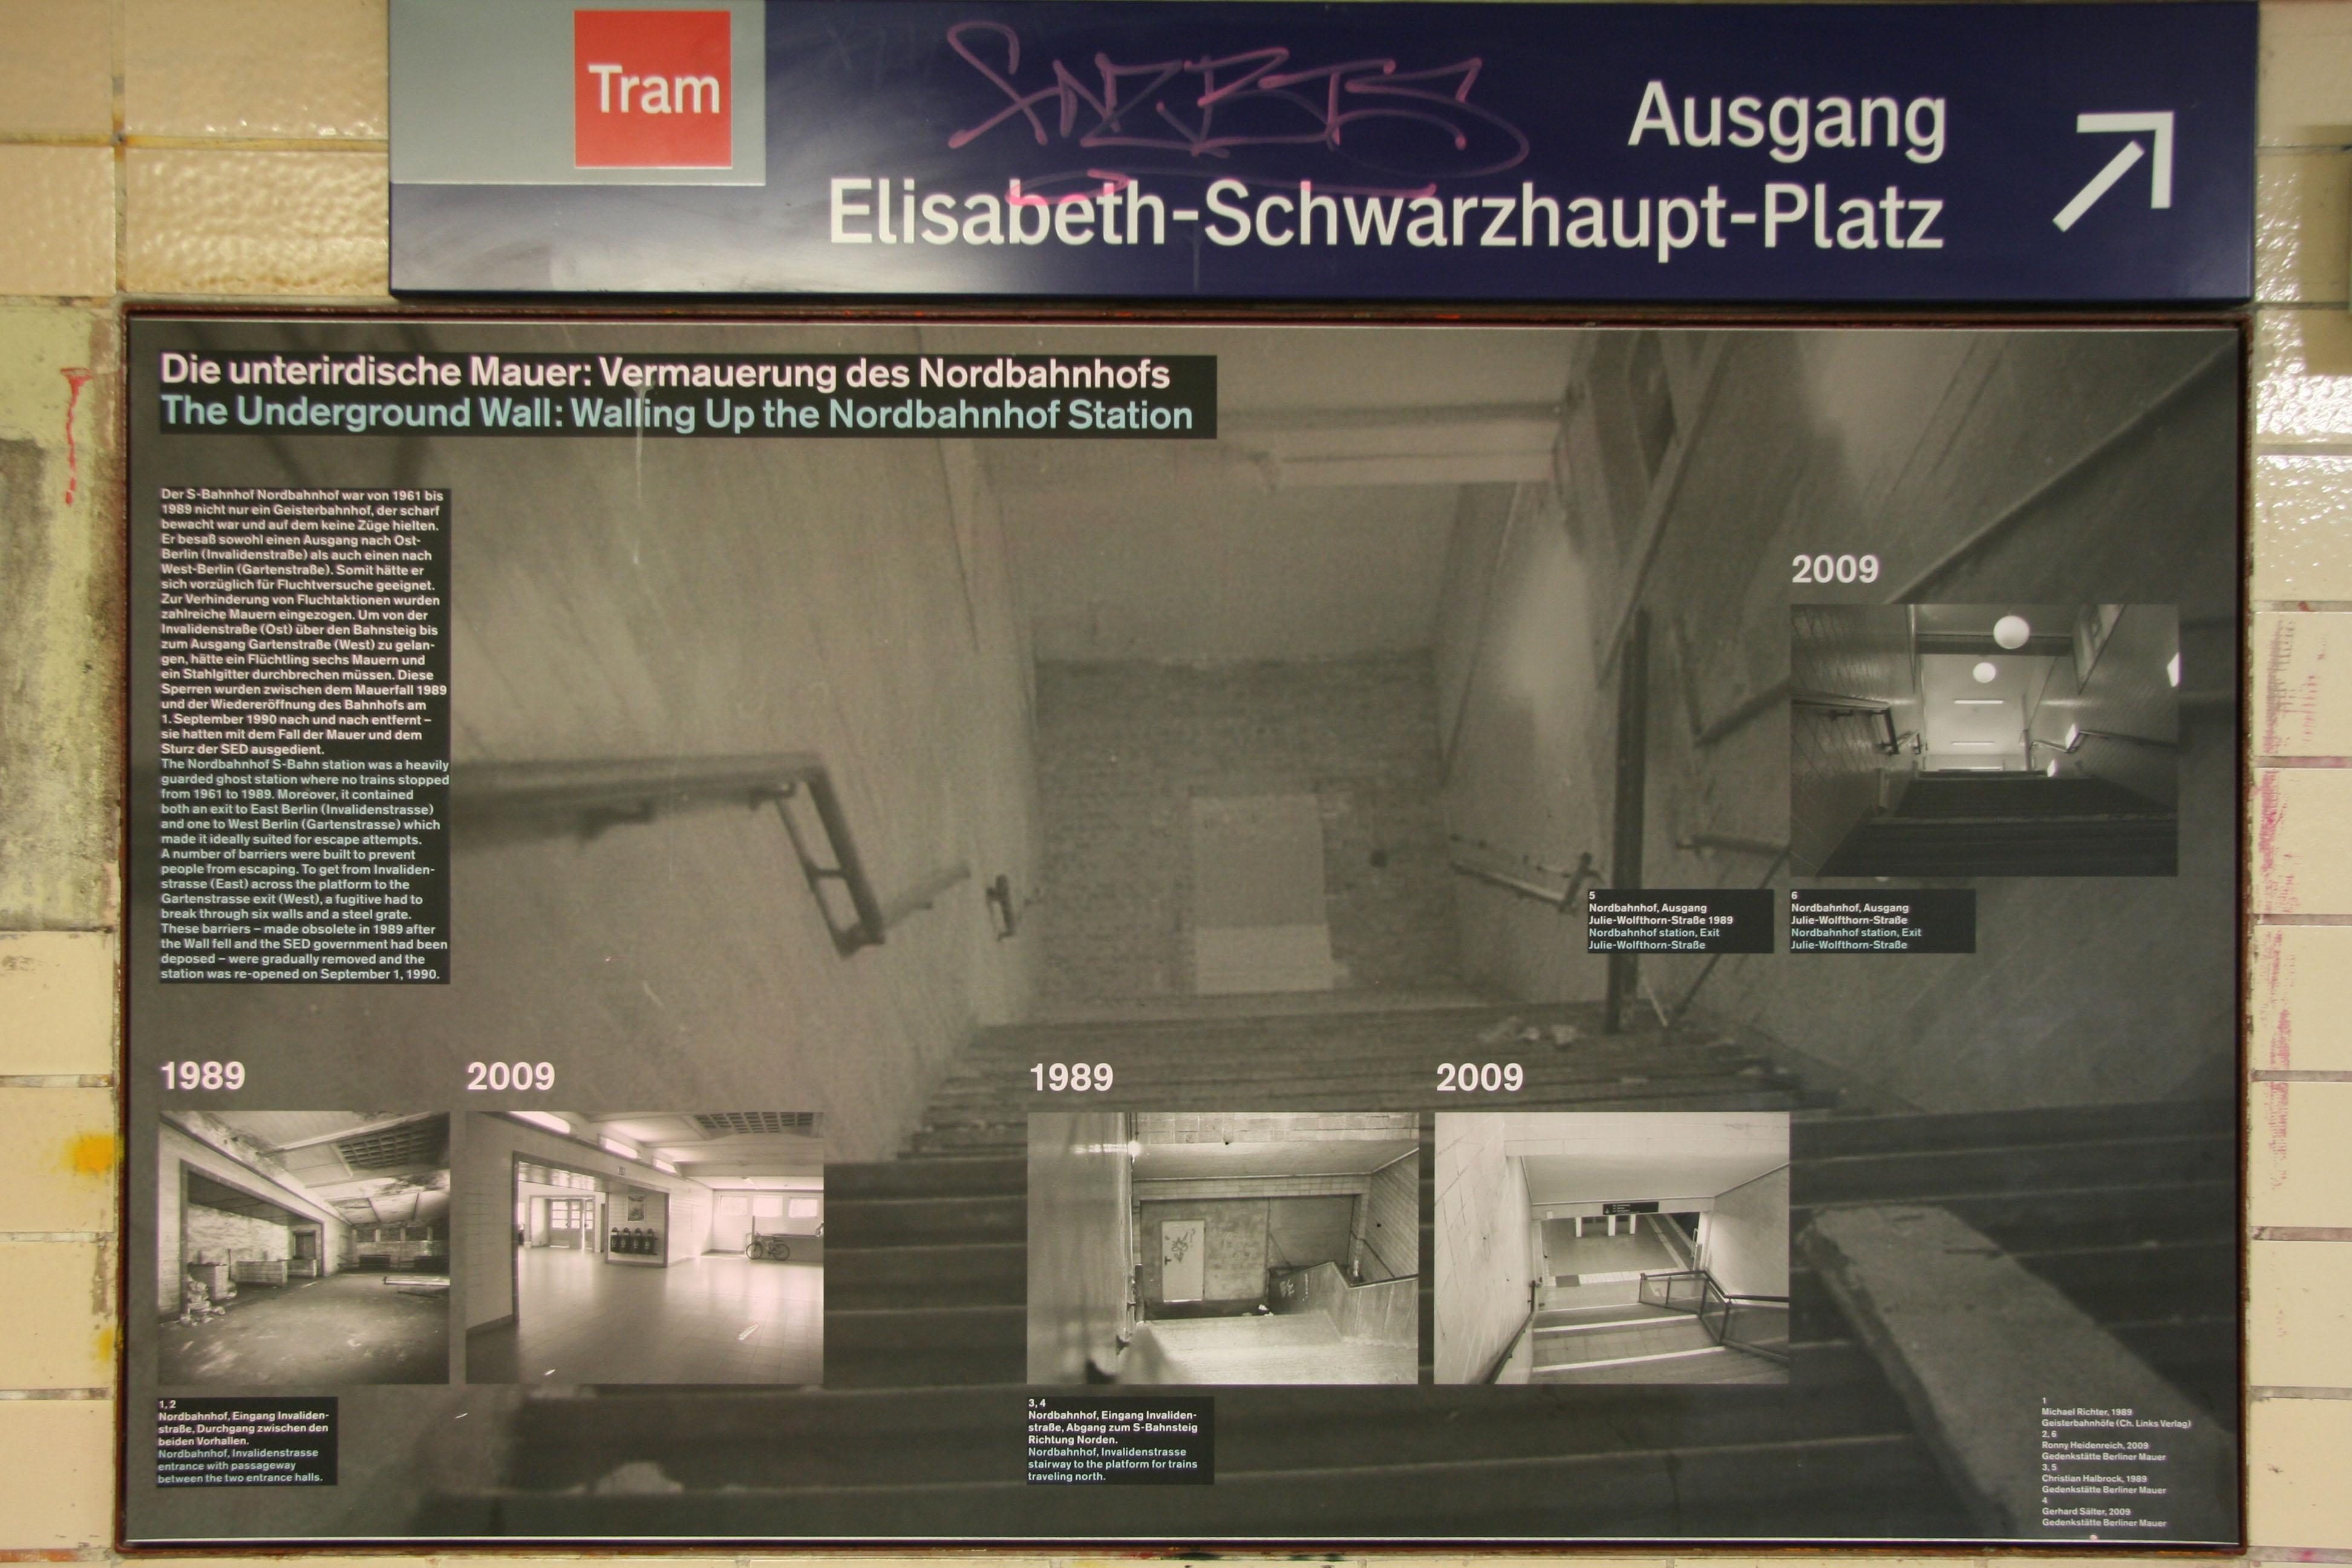 berlin wall memorial gedenkst tte berliner mauer. Black Bedroom Furniture Sets. Home Design Ideas